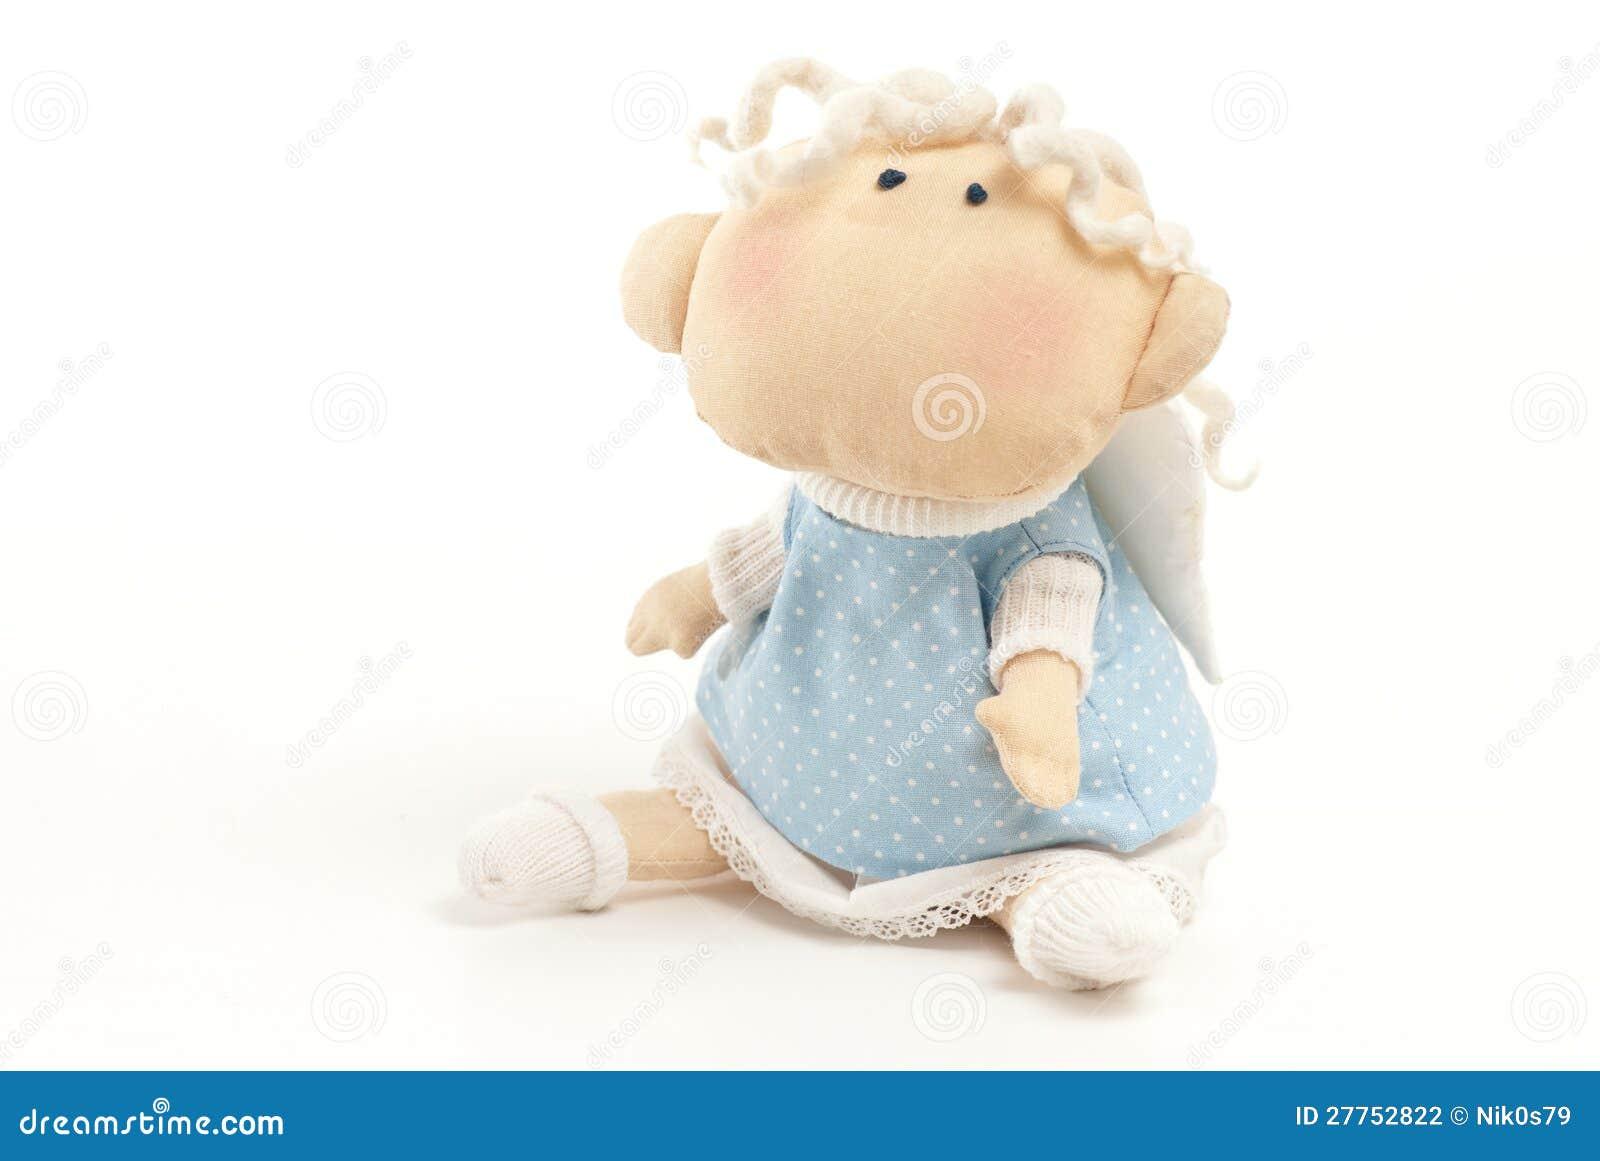 Little Angel Toys : Handmade toy angel boy stock photography image